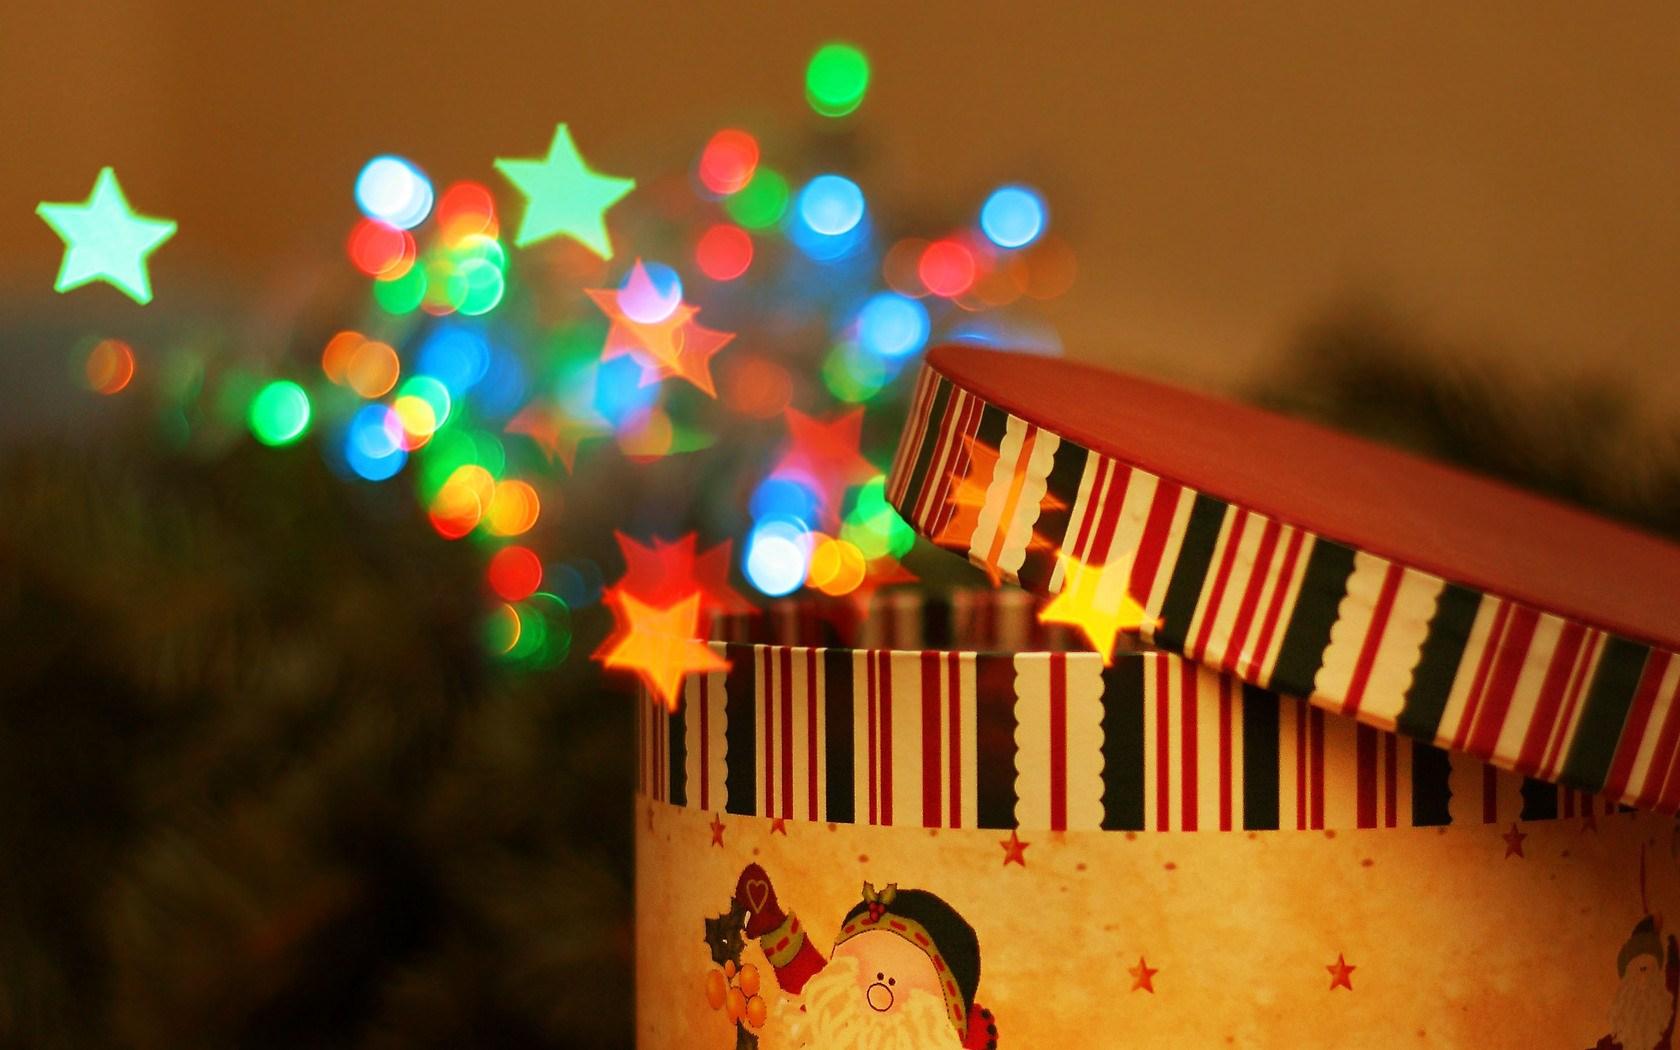 round-gift-box-christmas-colorful-stars-circles-1680x1050